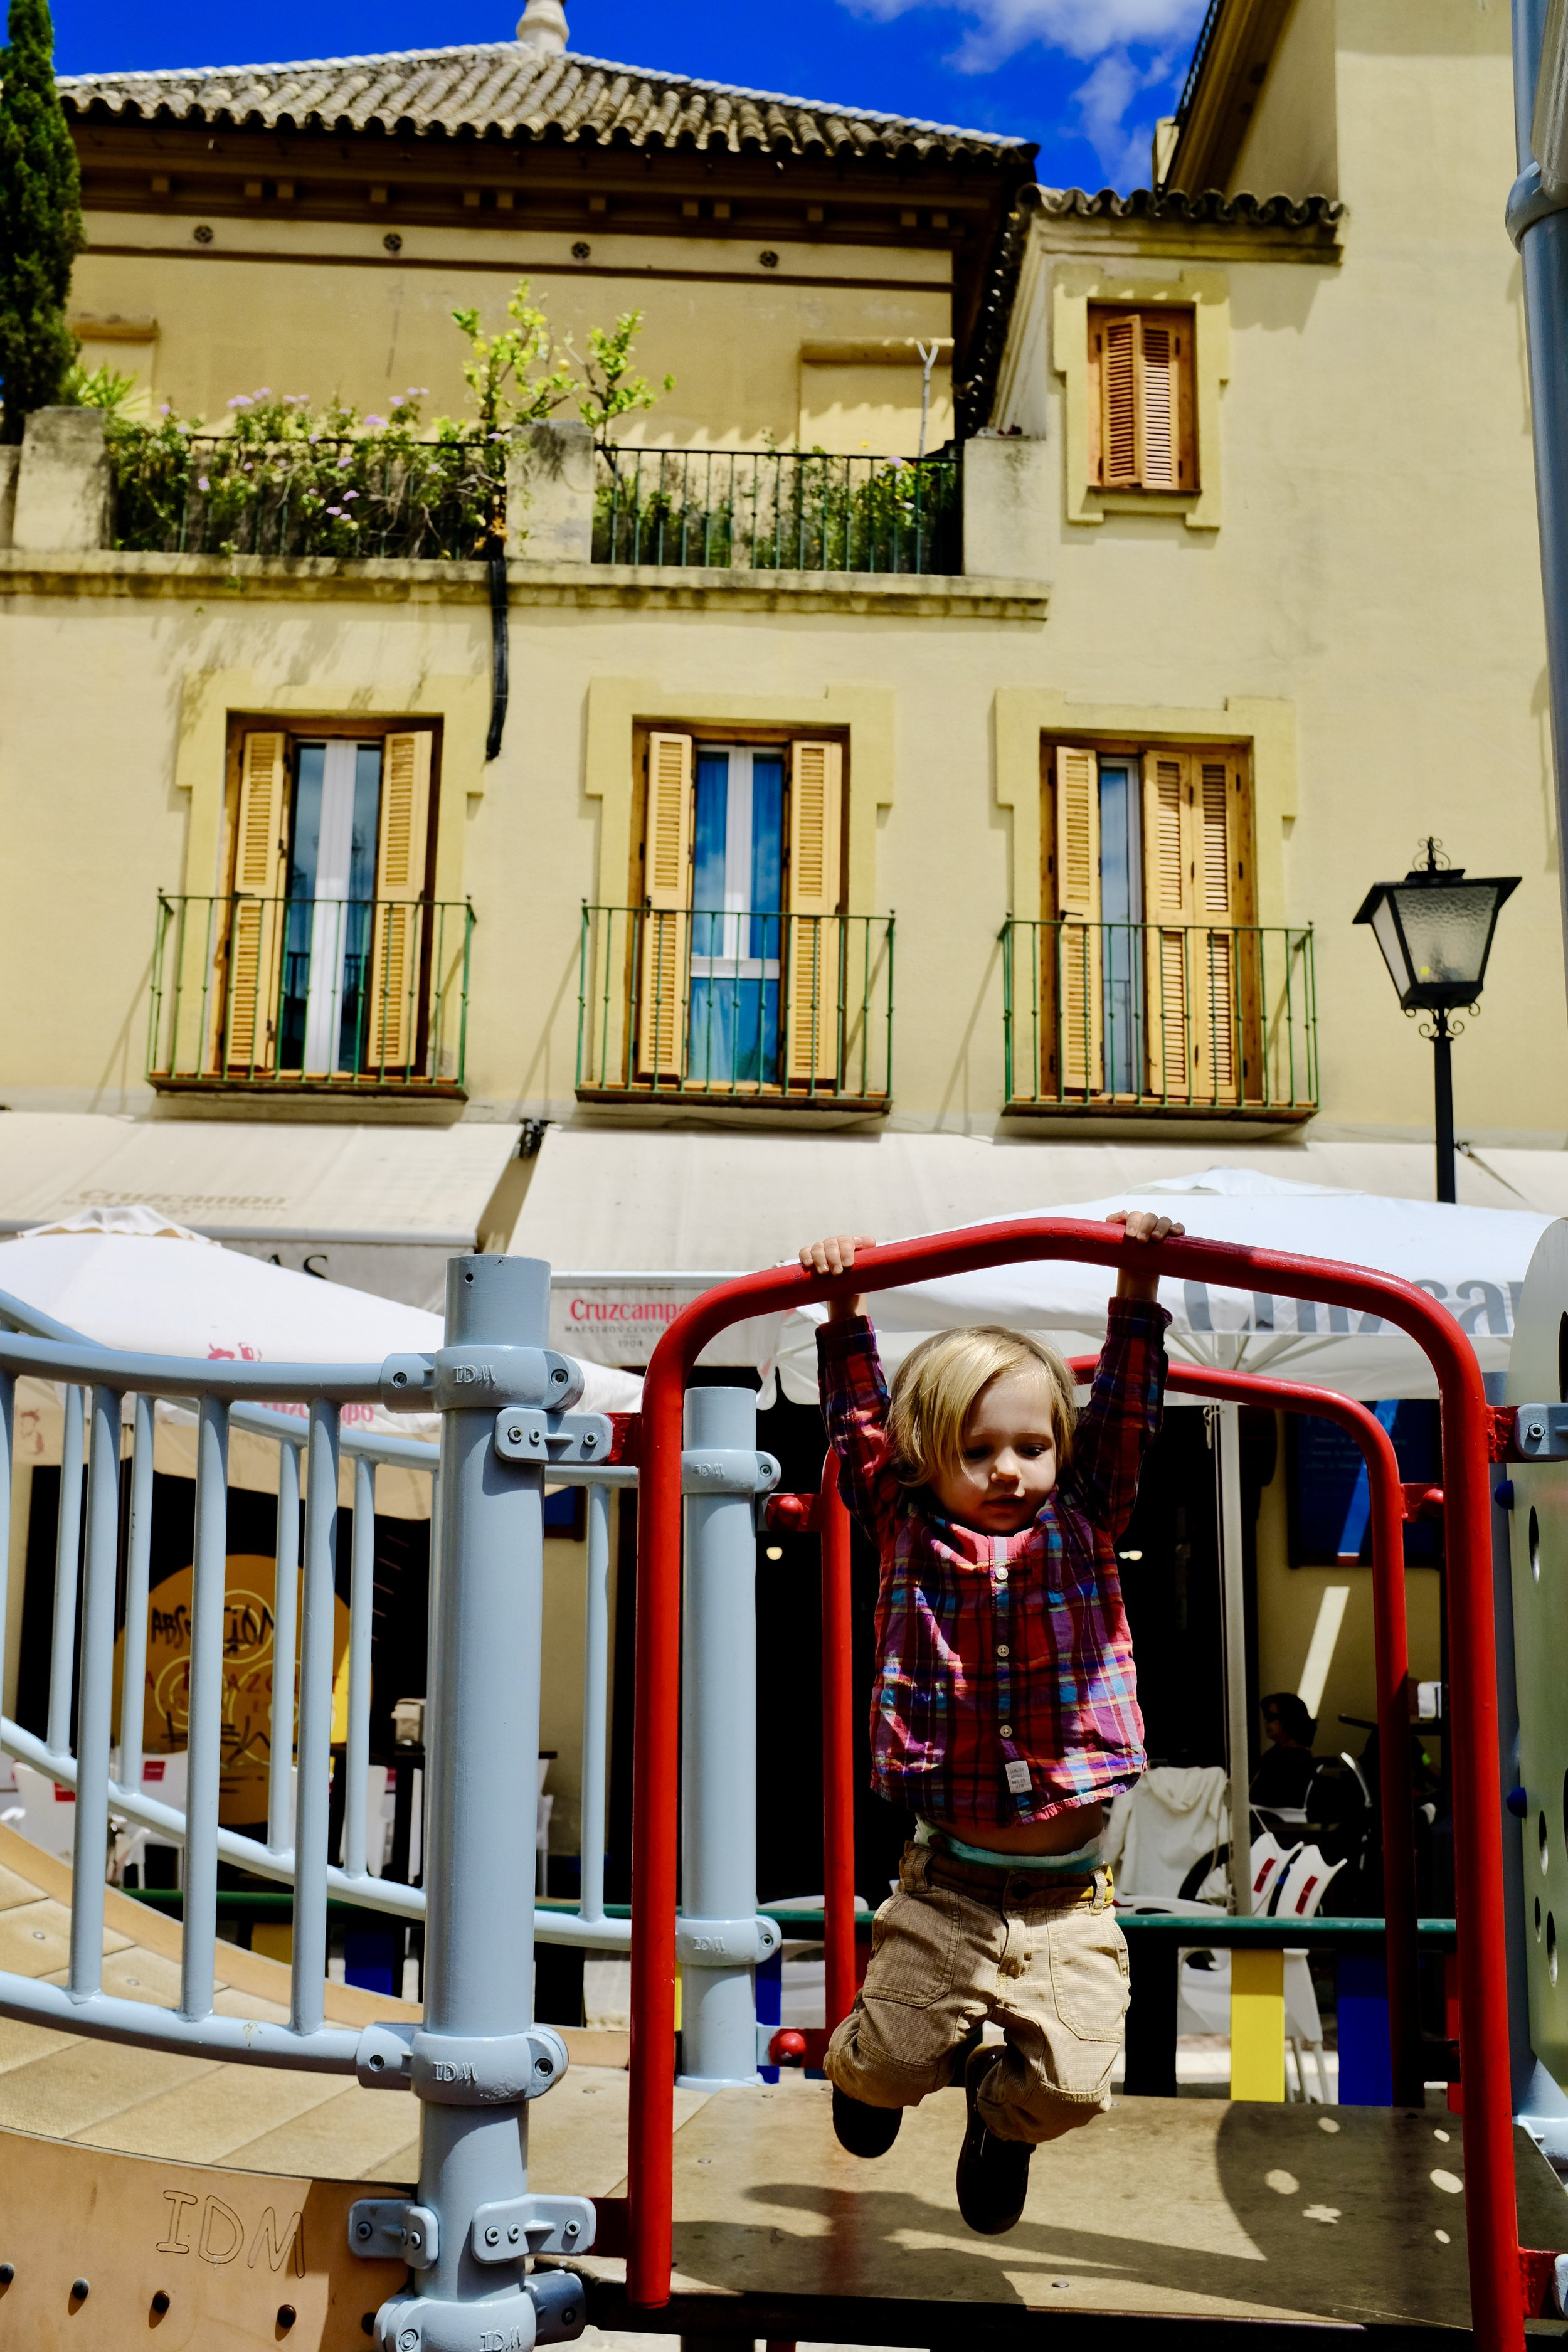 Zona de Juegos de Infantiles_City Nibbler_Seville